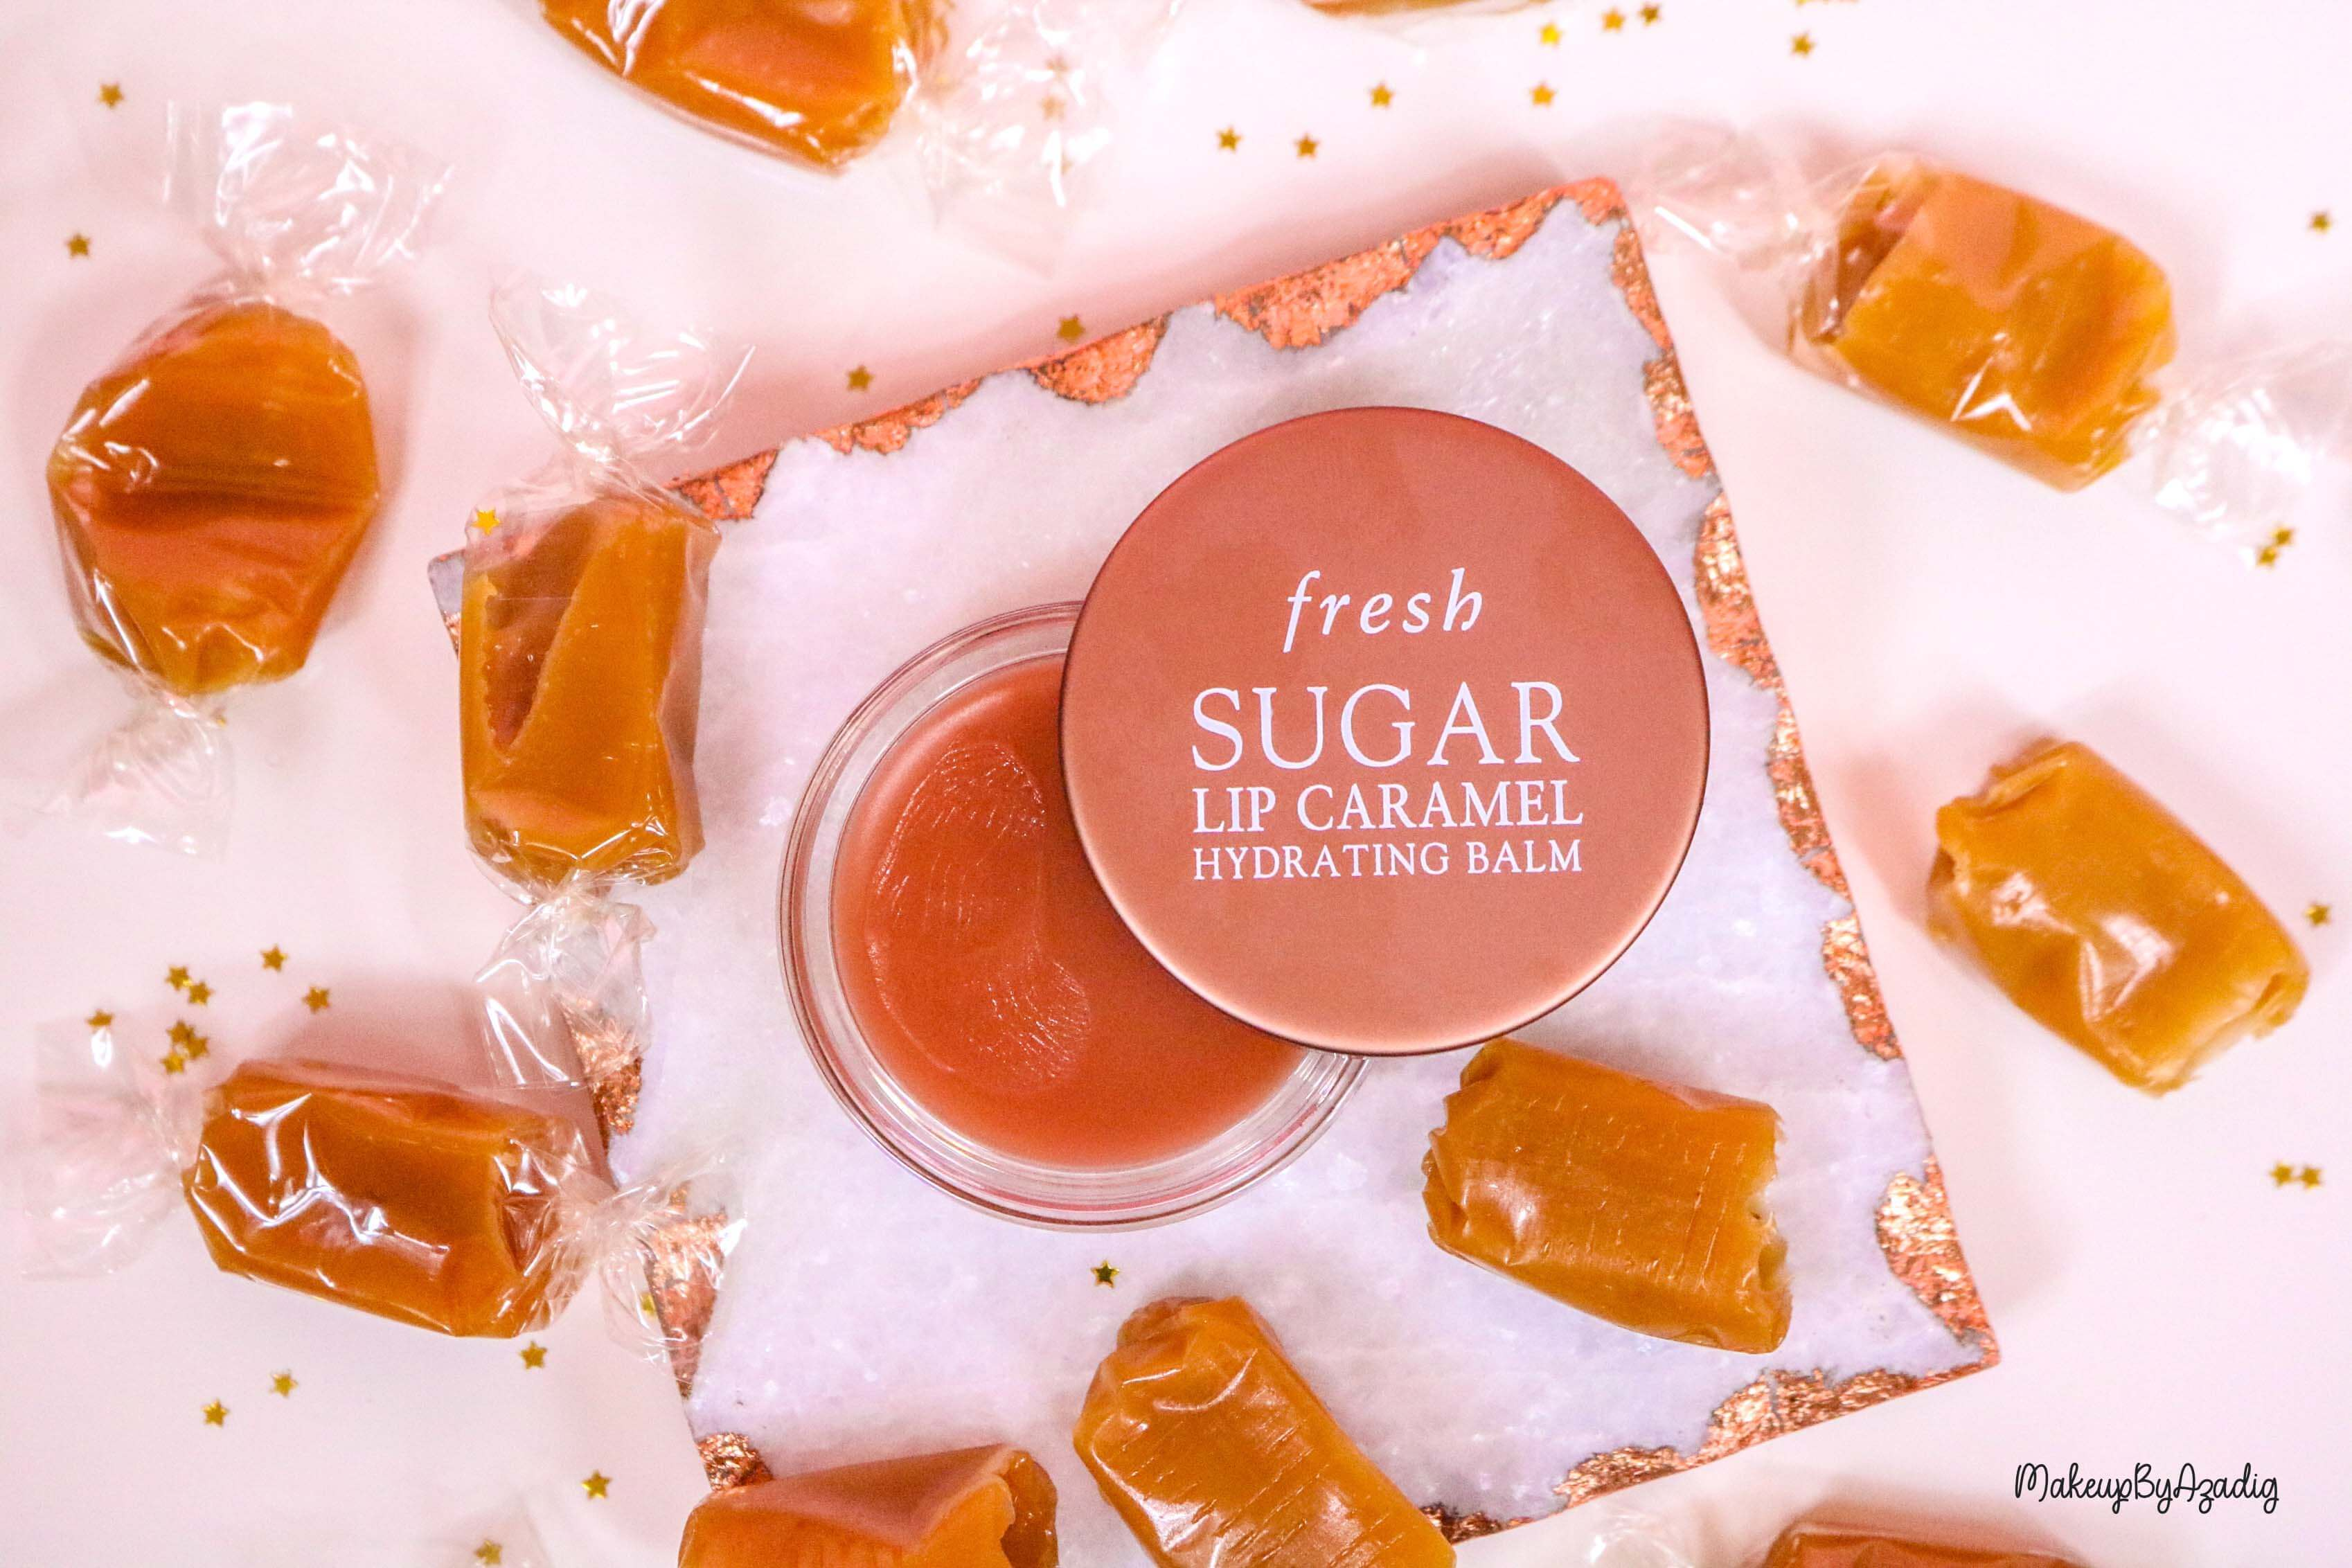 revue-baume-sucre-fresh-beauty-skincare-caramel-sugar-lip-caramel-sephora-makeupbyazadig-avis-prix-balm-chocolat